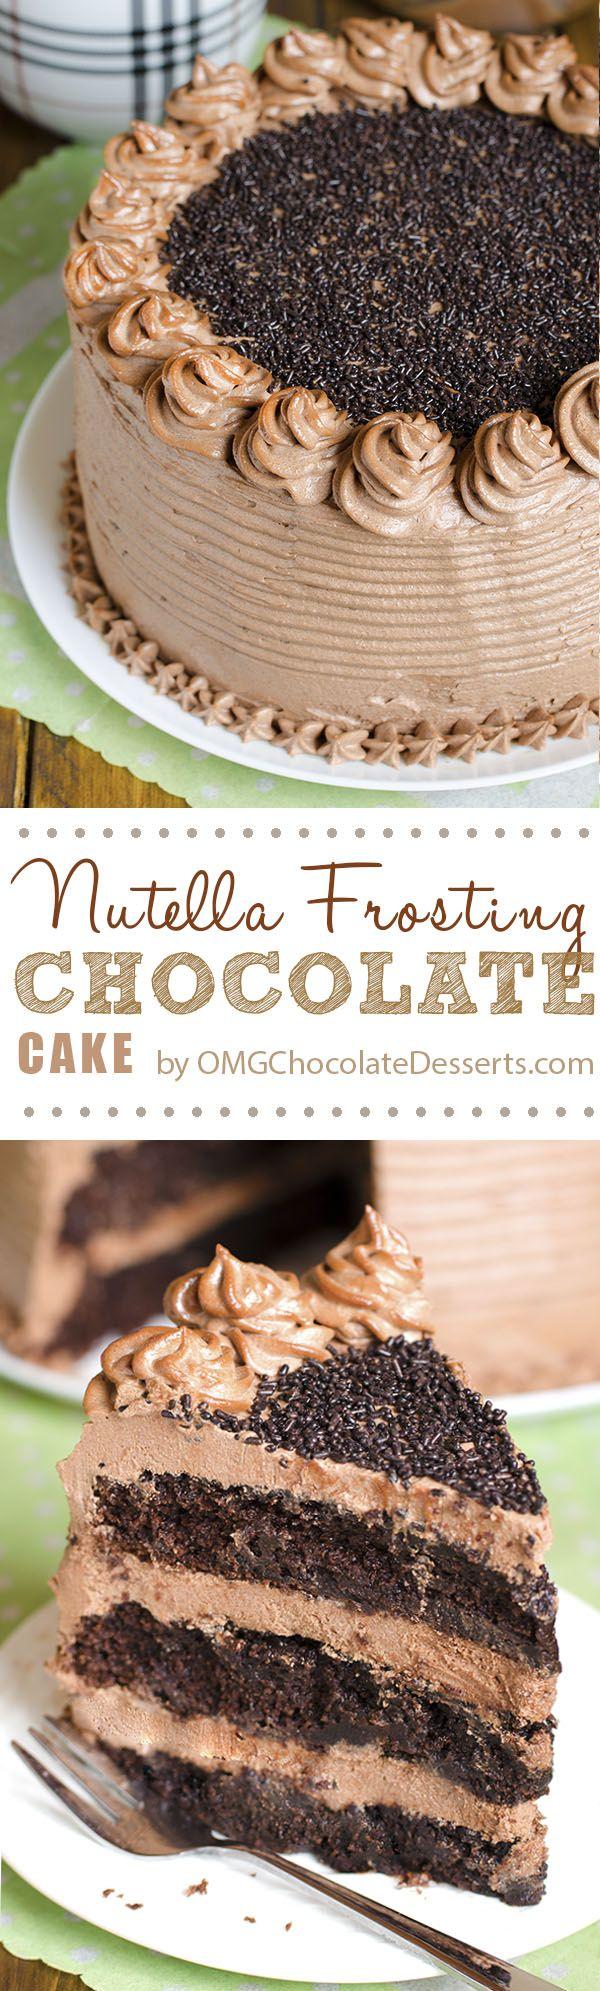 Decadent Nutella Chocolate Cake - Chocolate Dessert Recipes - OMG ...